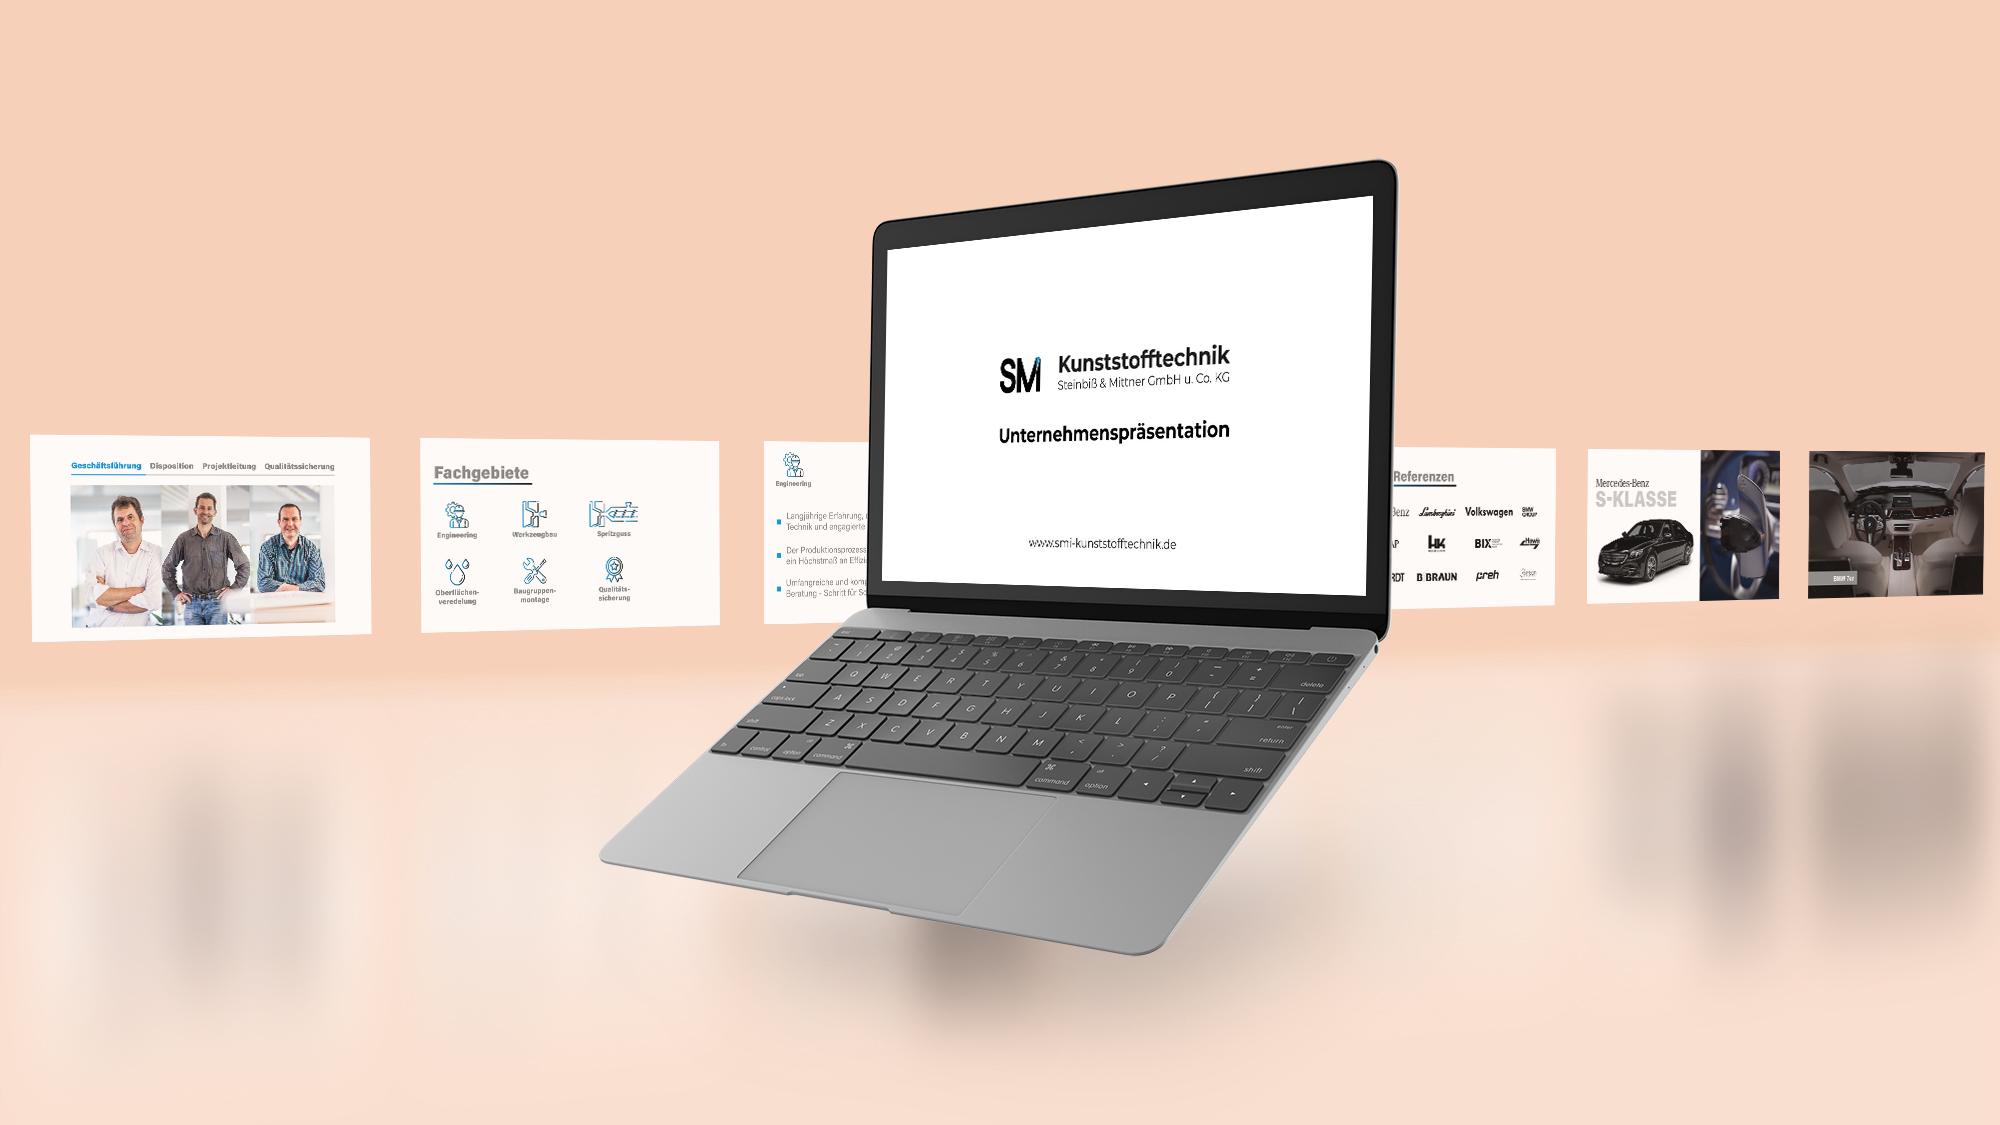 kopfmedia-smi-kunststofftechnik-unternehmenspraesentation-powerpoint-pp-mockup